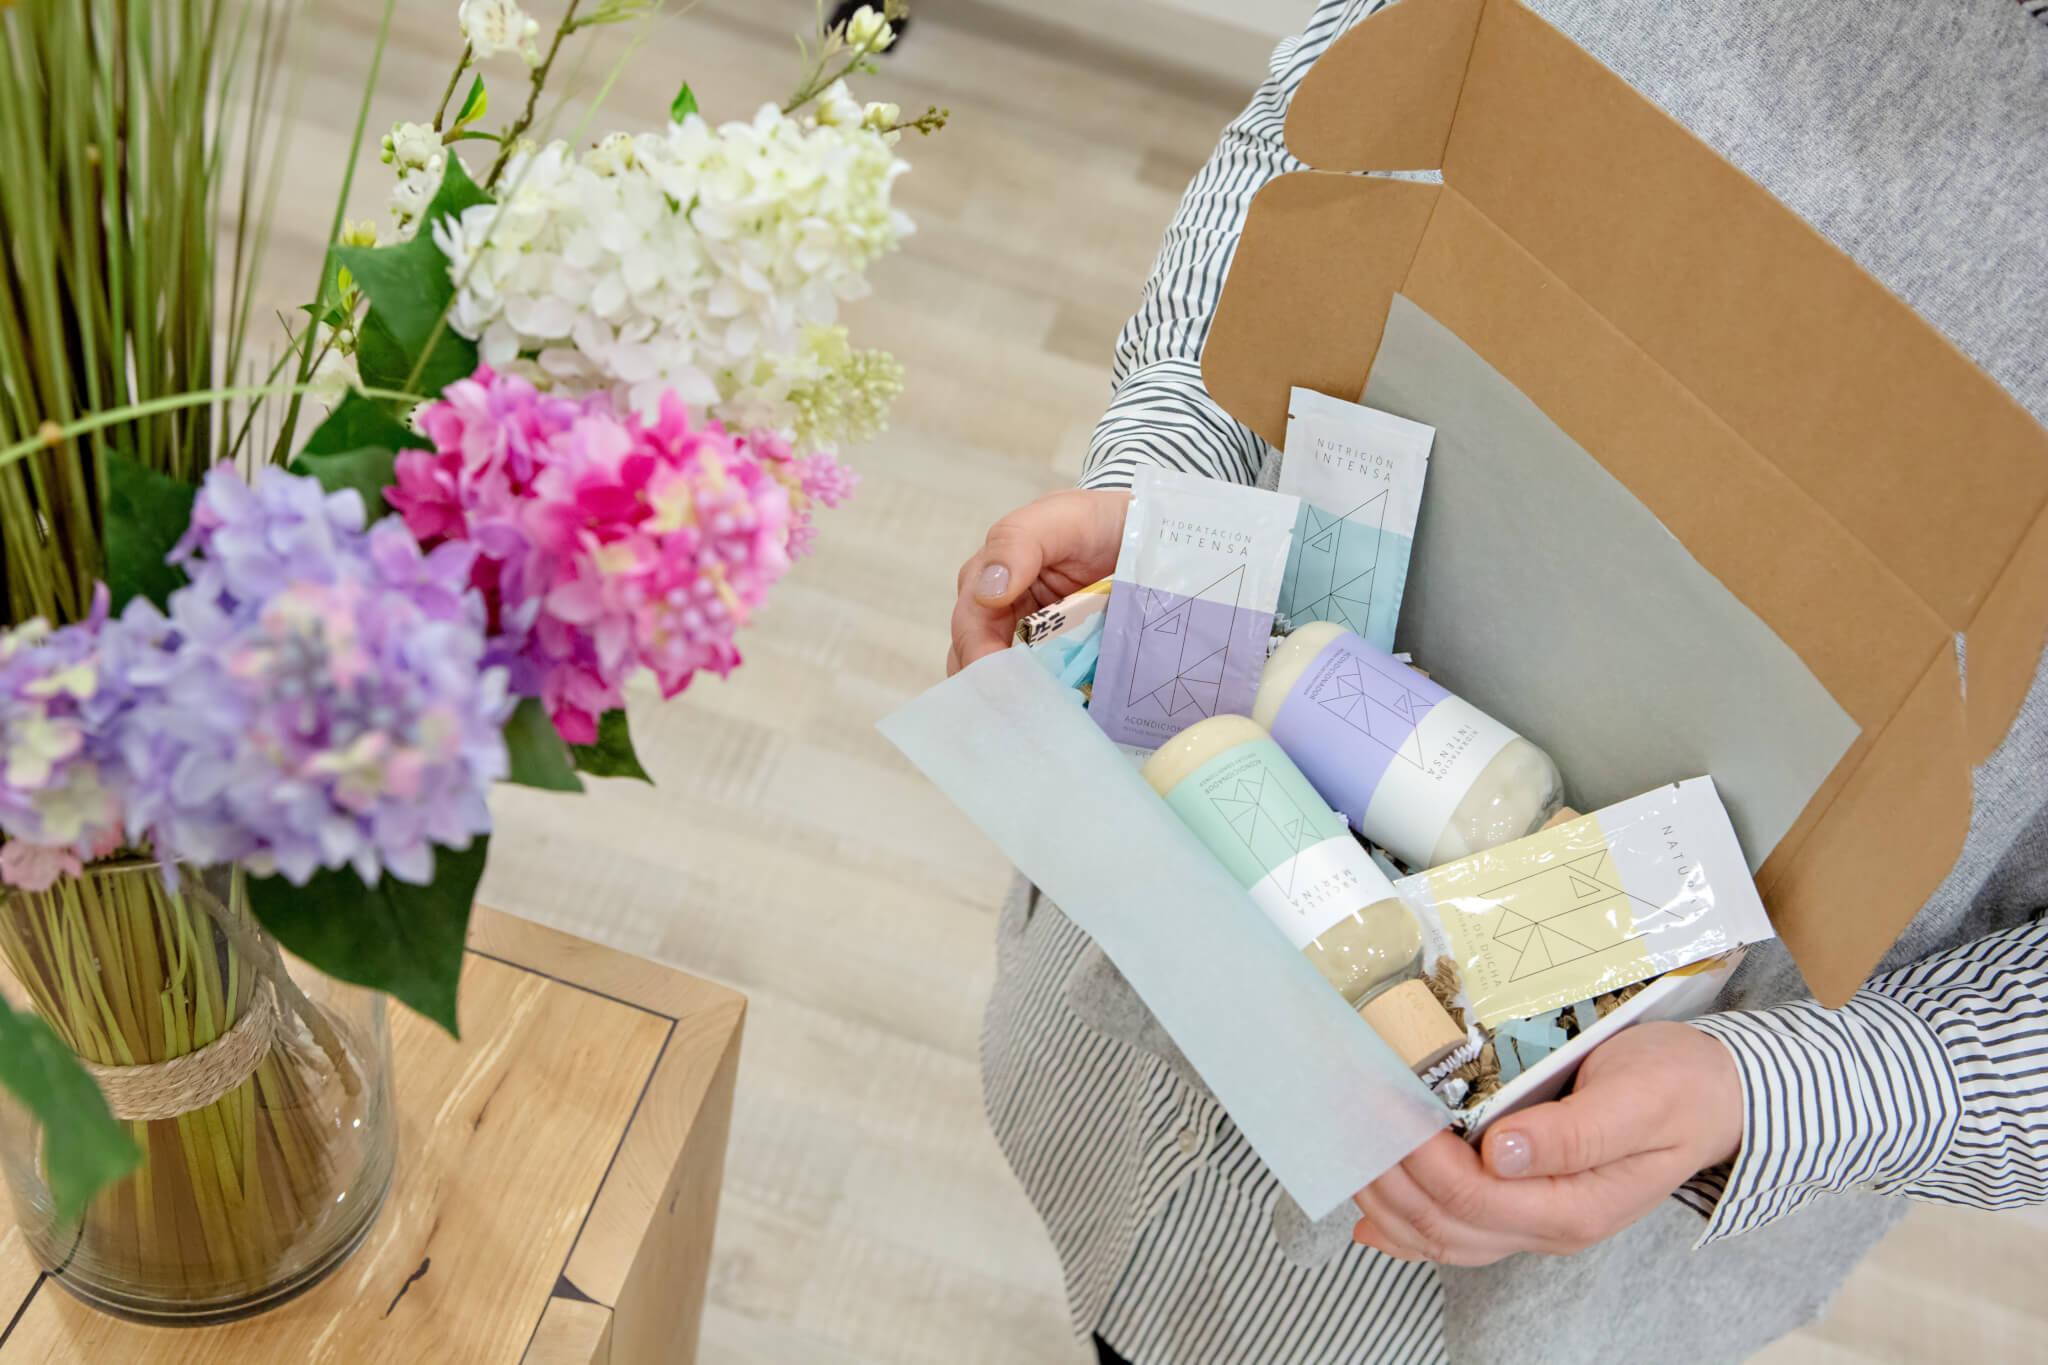 Die Verpackung von Eco Beauty Wellness